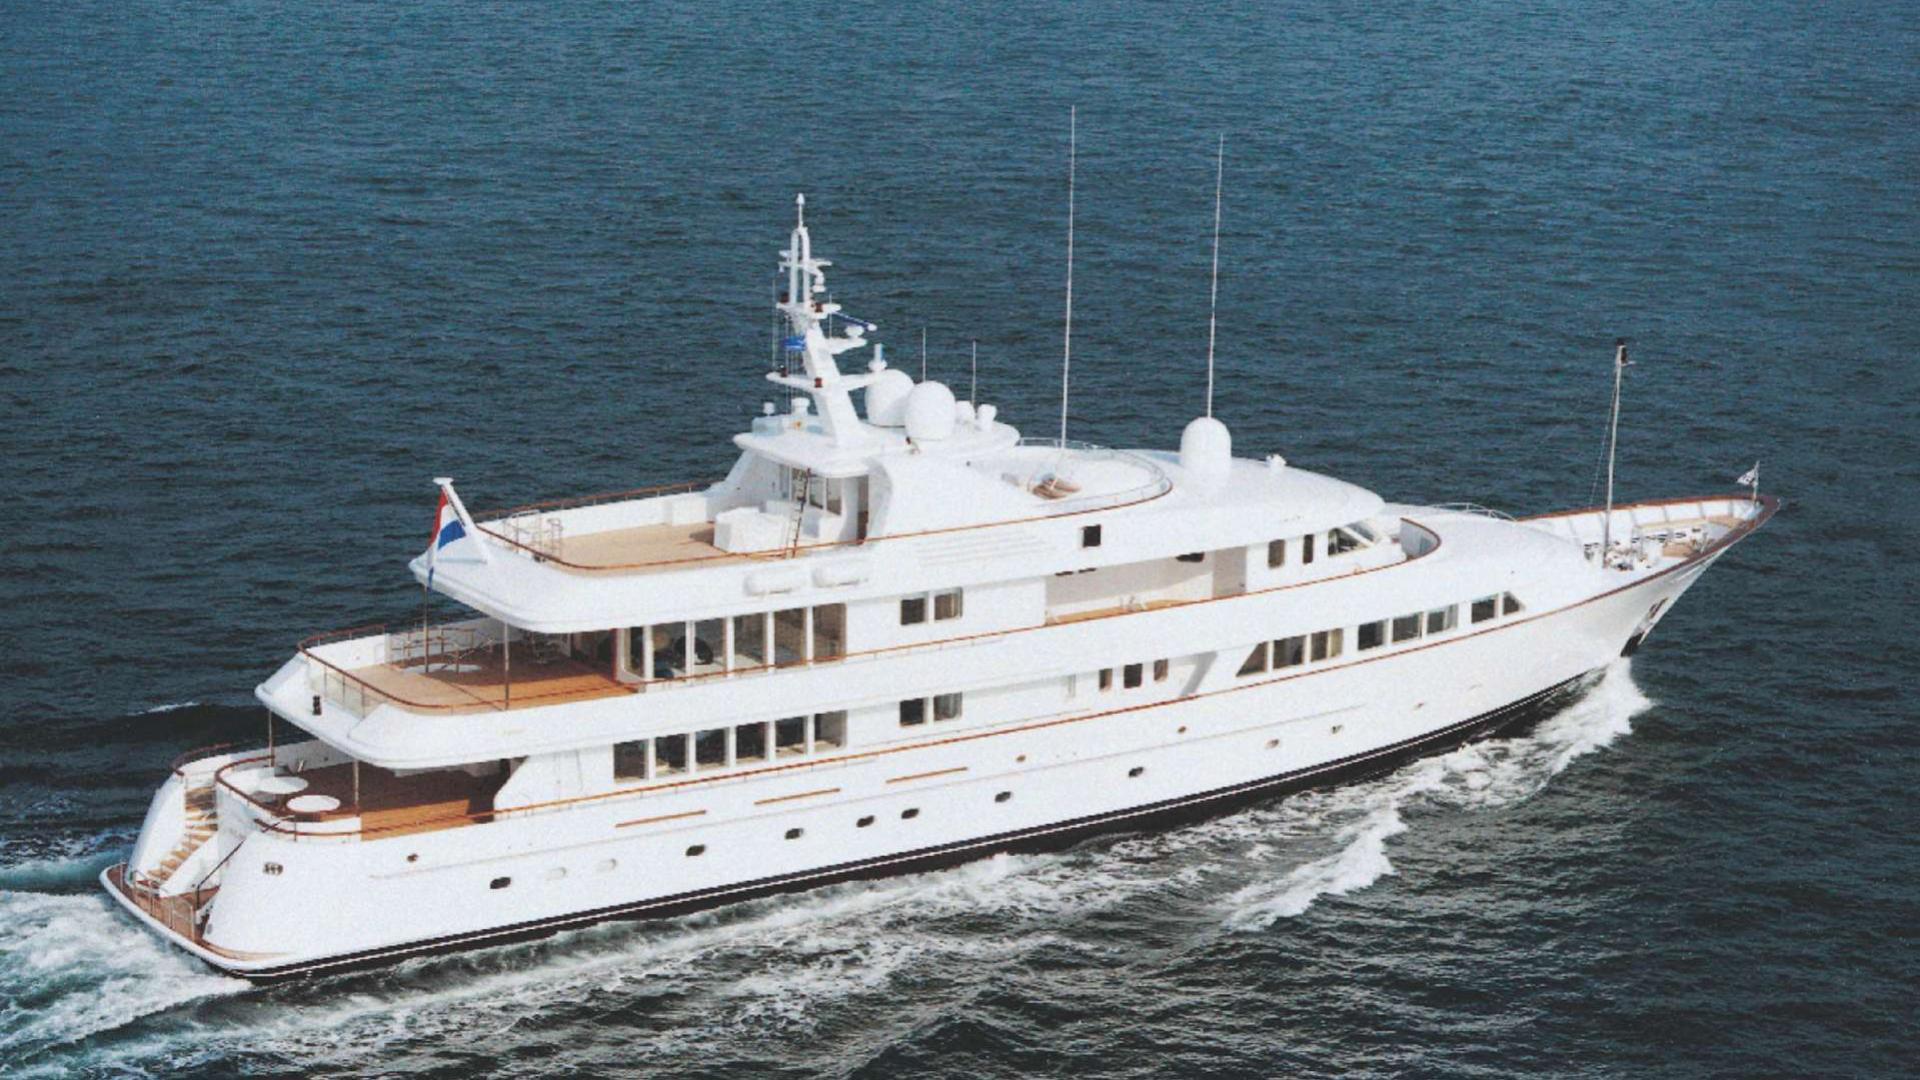 Olympia-motor-yacht-feadship-2002-57m-cruising